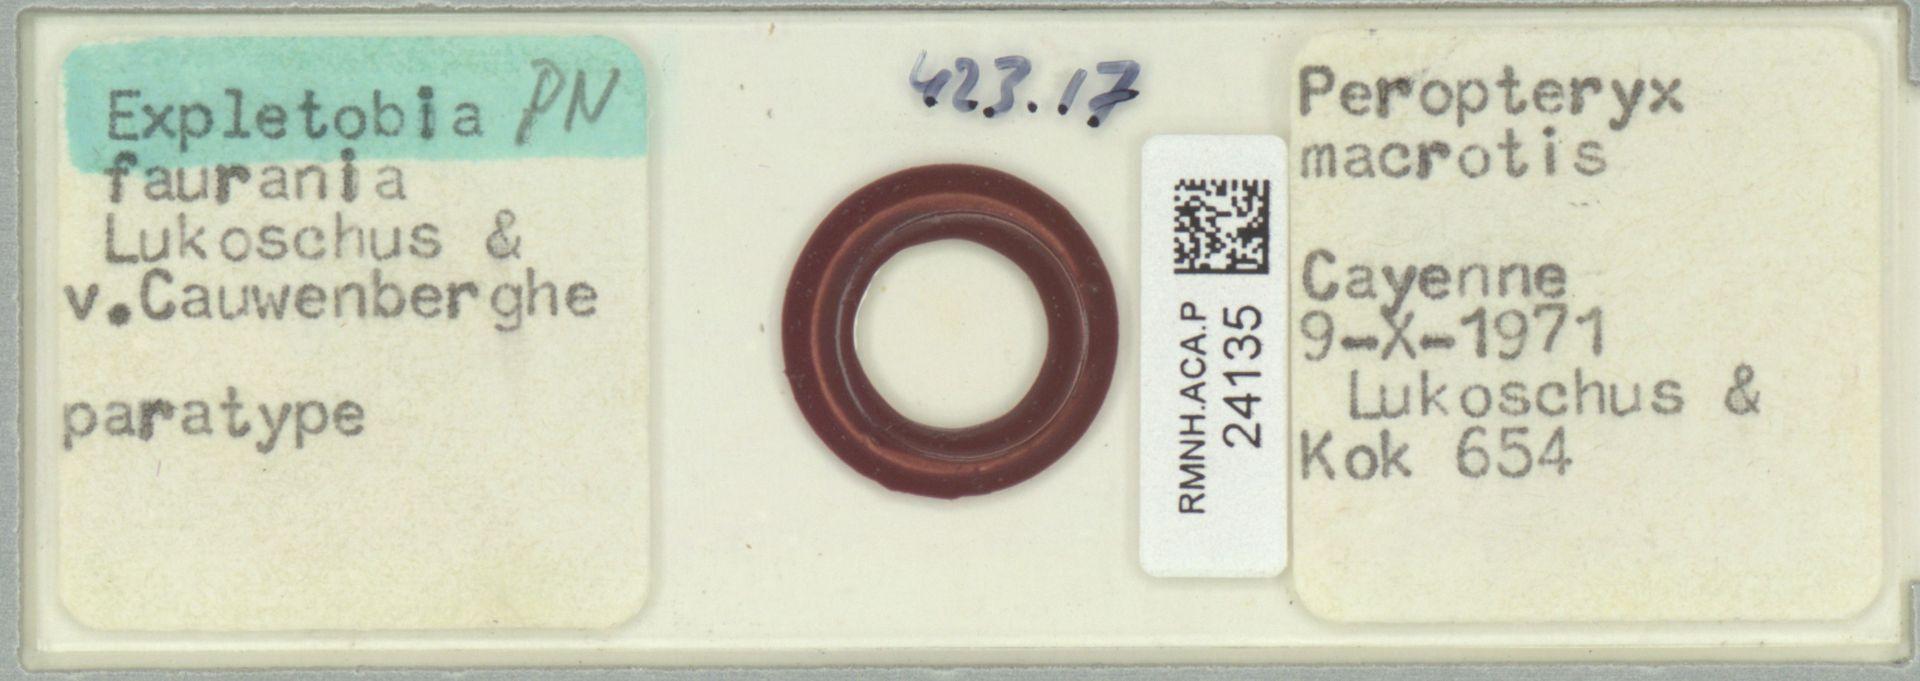 RMNH.ACA.P.24135 | Expletobia faurania Lukoschus & v. Cauwenberghe